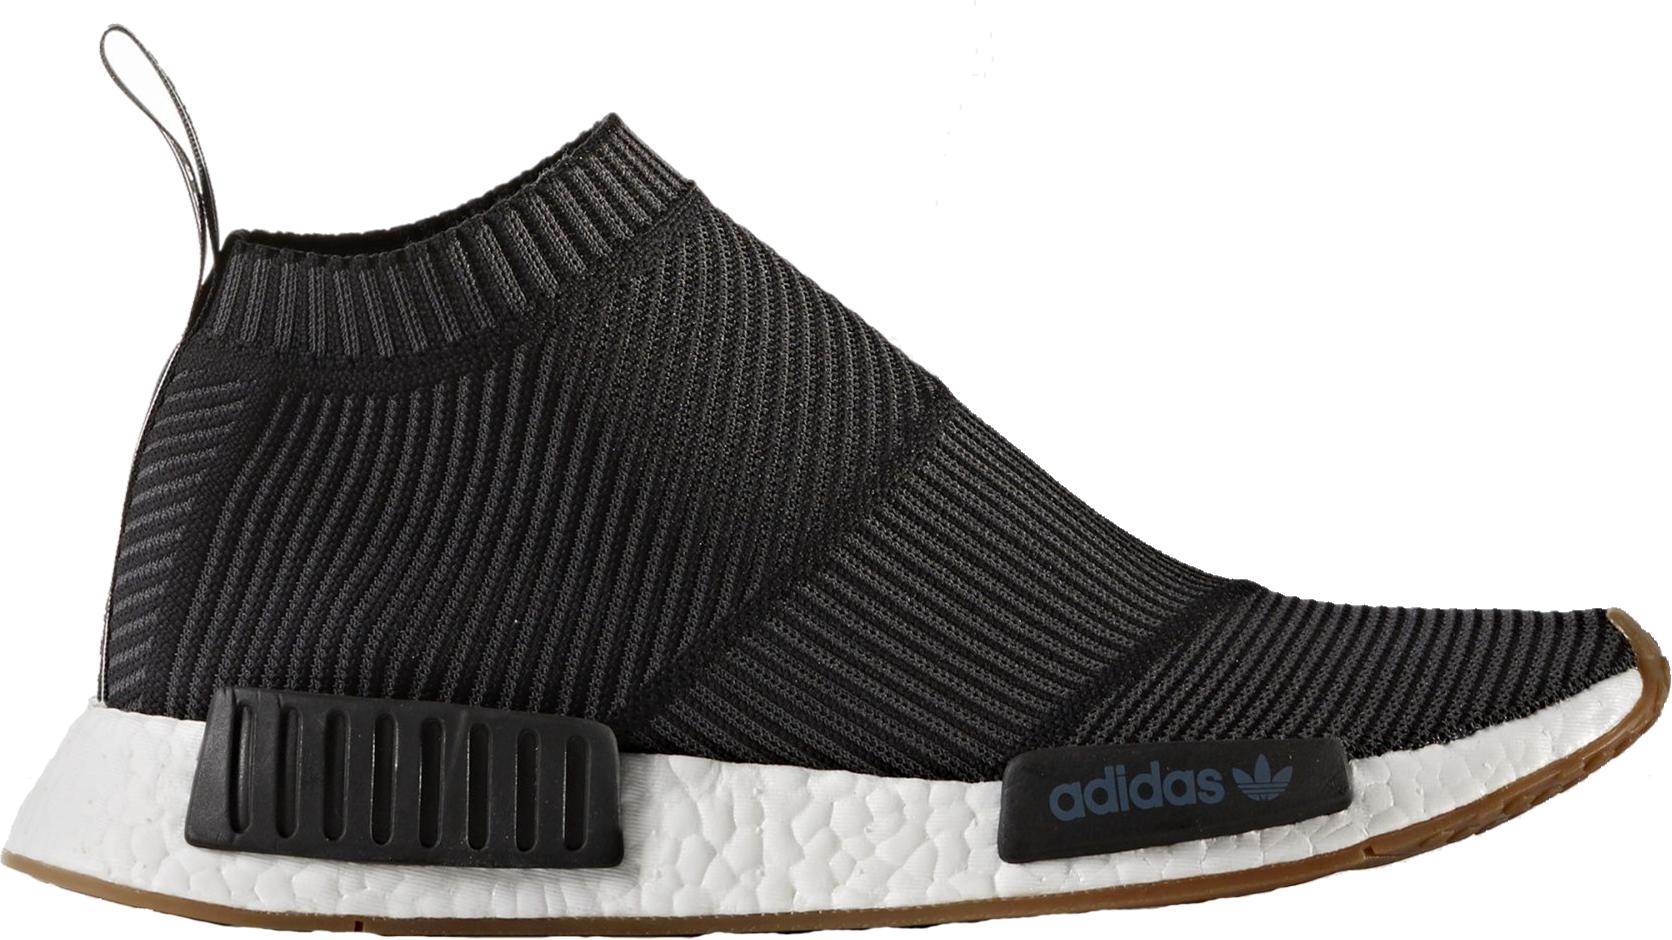 adidas NMD City Sock Gum Pack Black